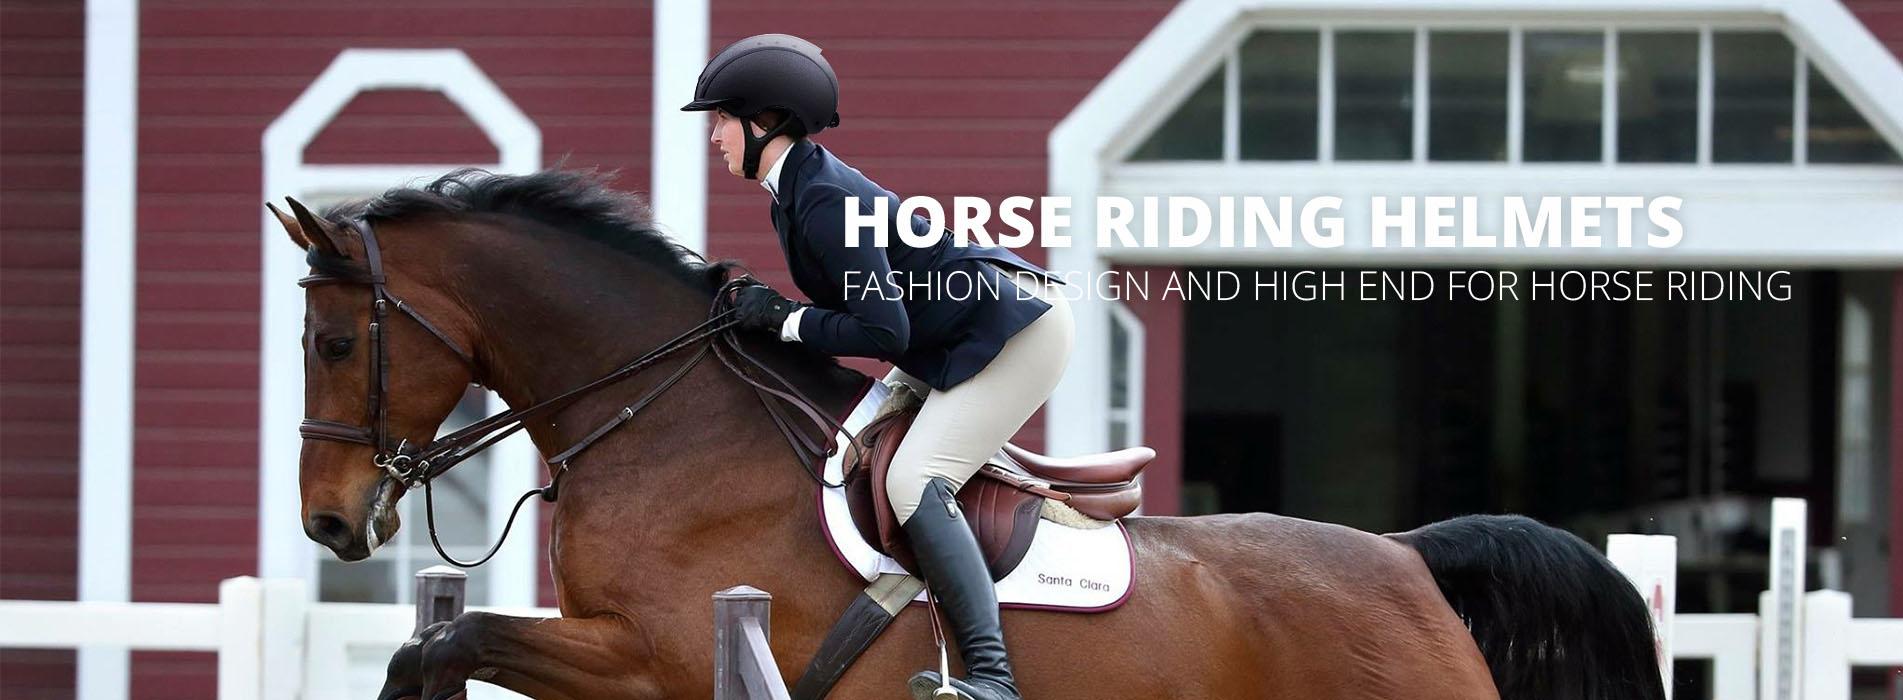 equestrian helmet banner